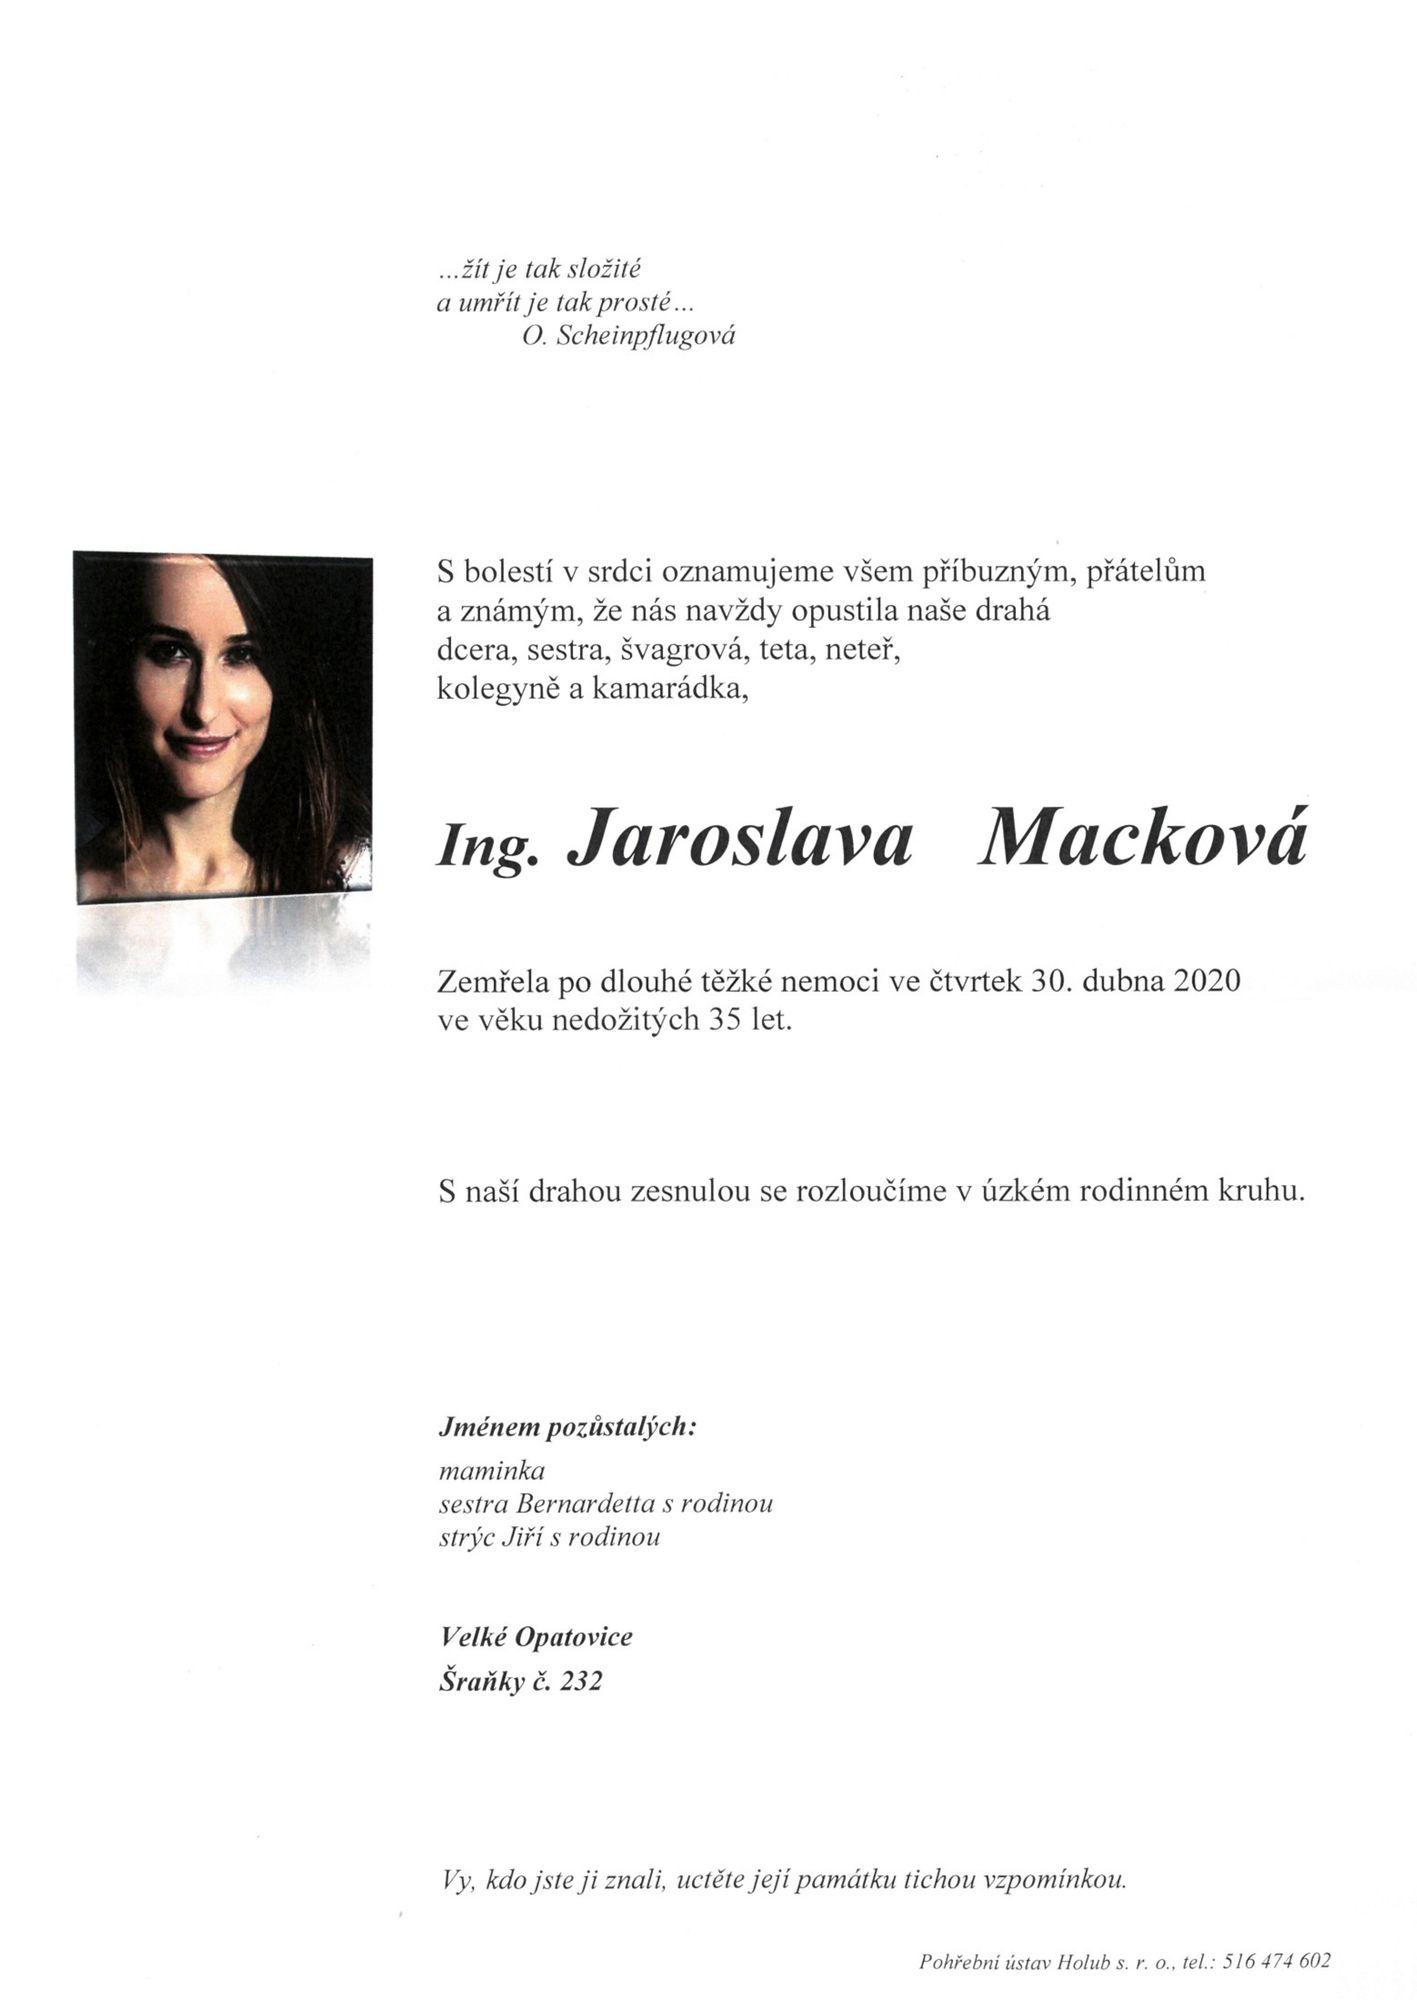 Ing. Jaroslava Macková